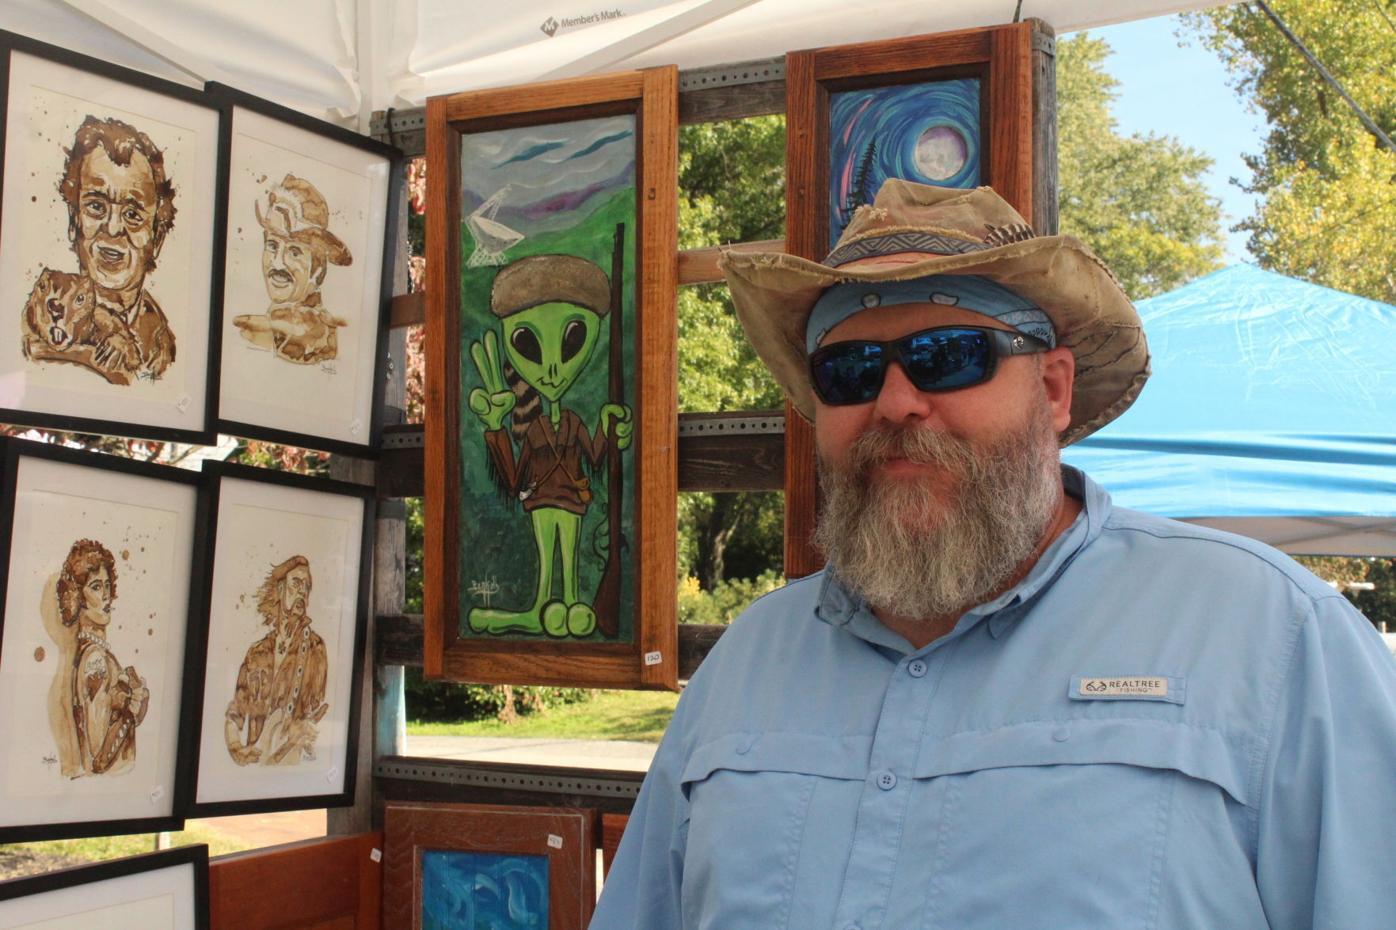 Ben Kolb from Nativibes Art Studio and Gallery